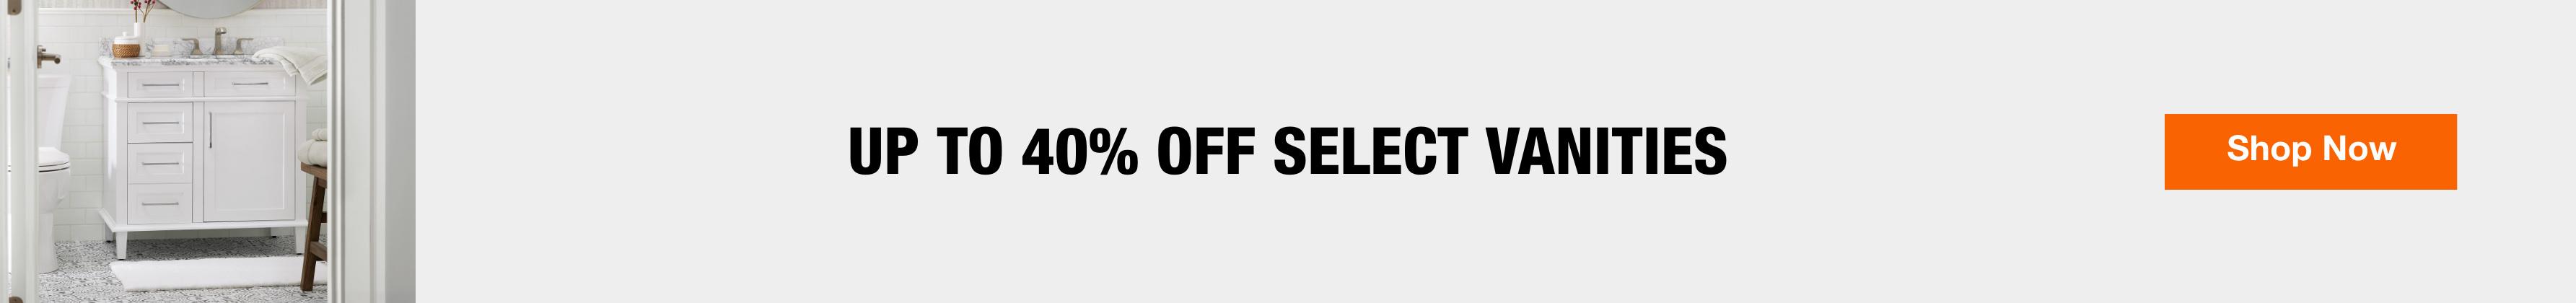 Up to 40% off select vanities